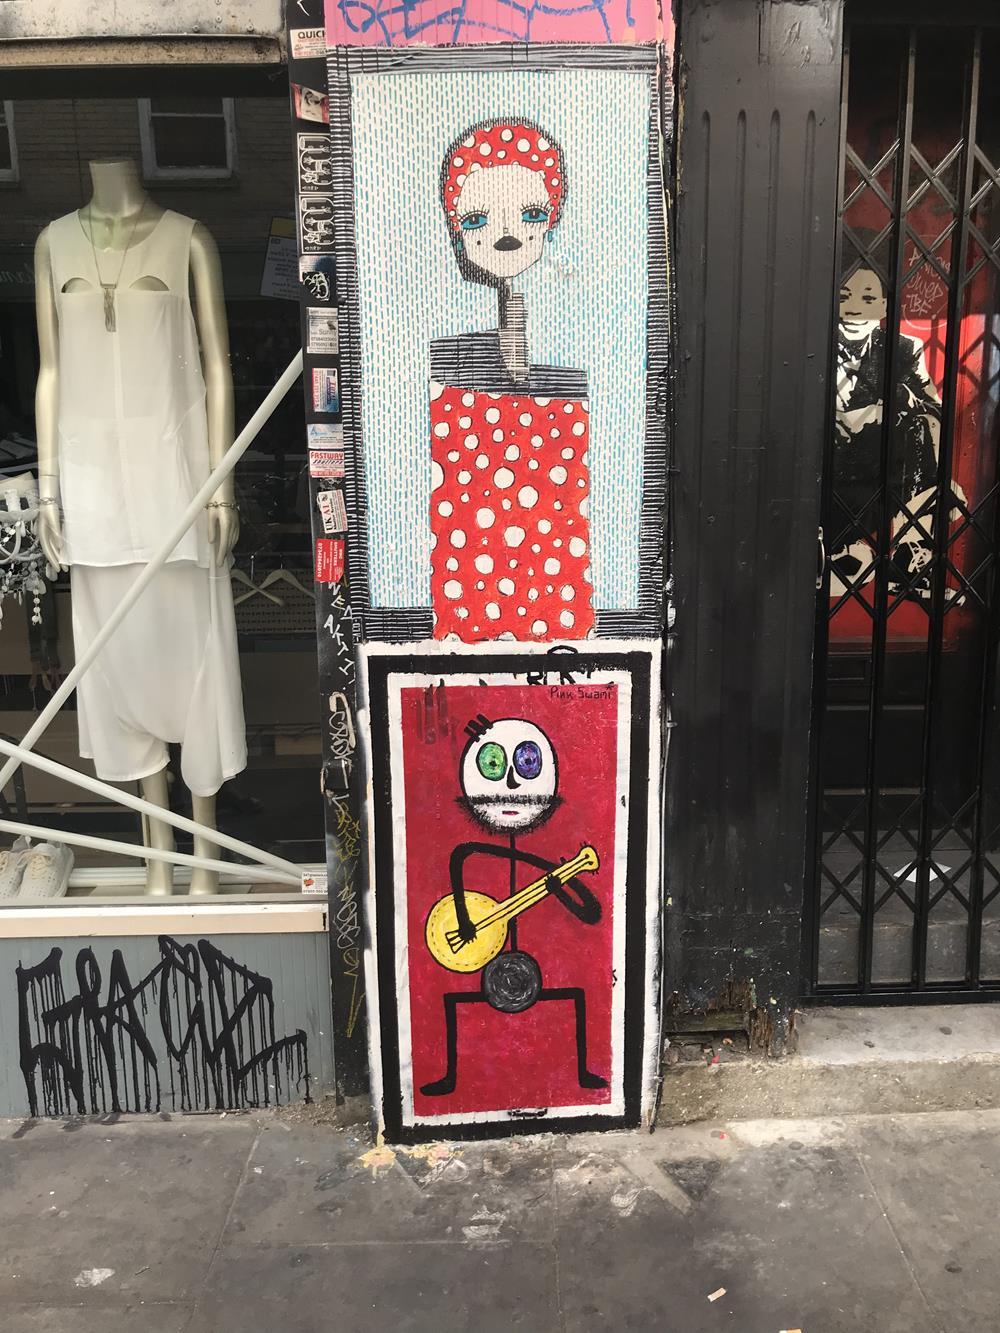 Paste-up street art in Shoreditch